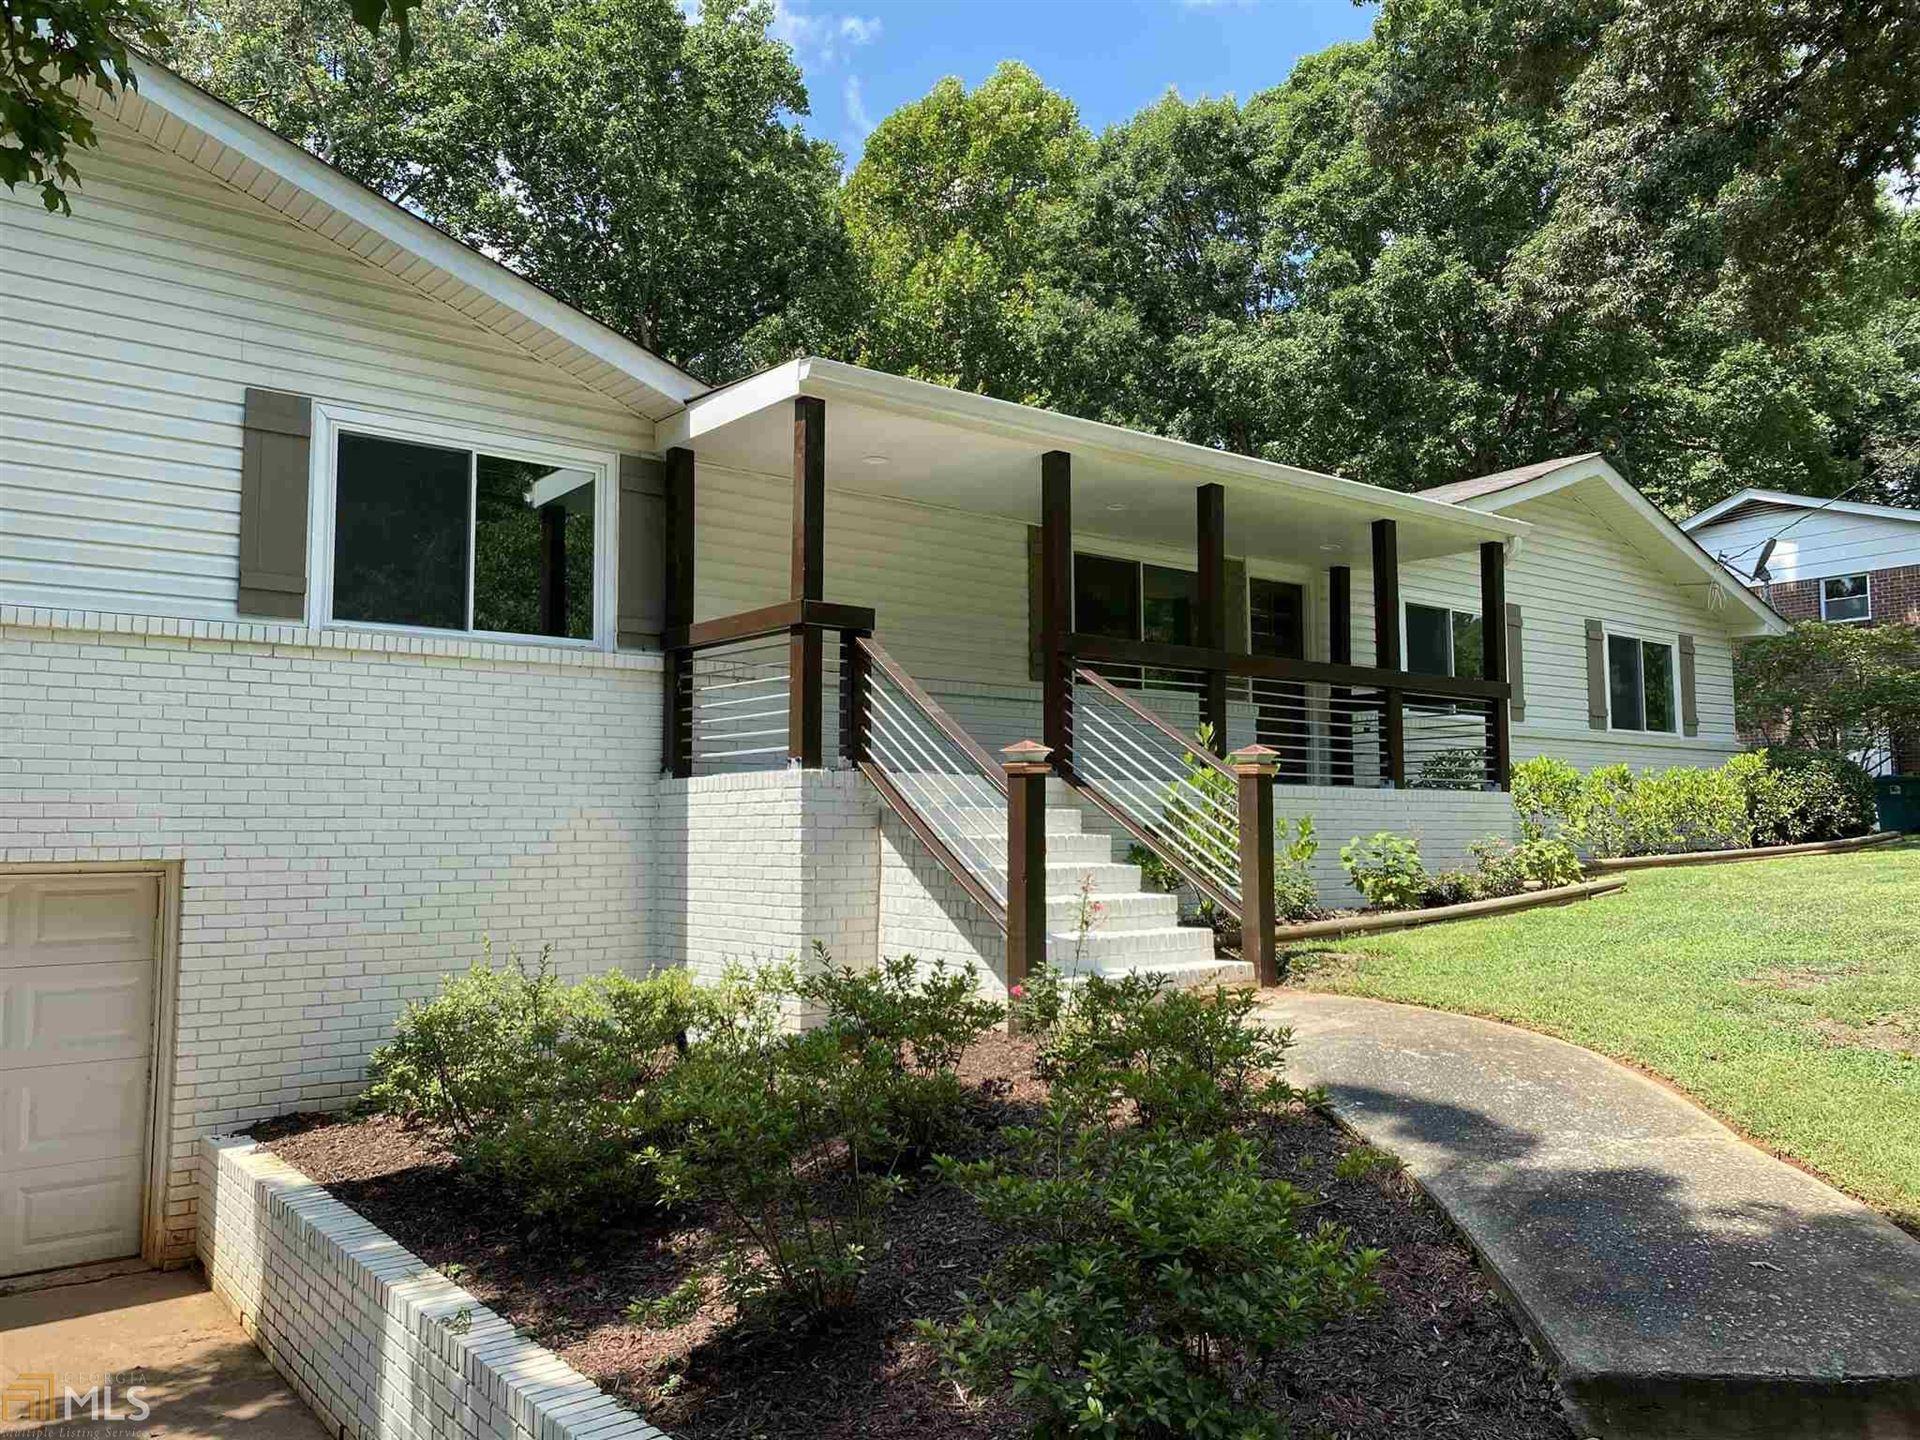 3958 Lake Dr, Smyrna, GA 30082 - MLS#: 8805155